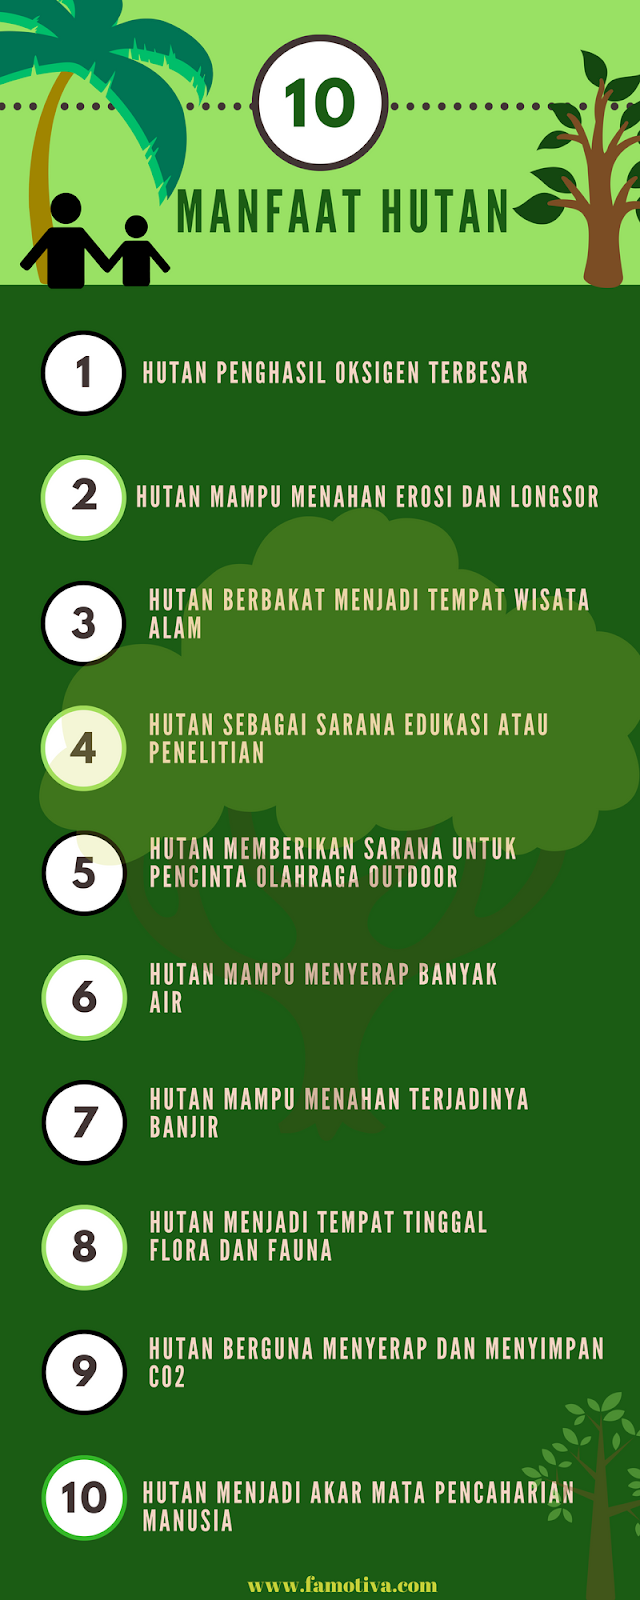 Sebutkan Manfaat Hutan Mangrove : sebutkan, manfaat, hutan, mangrove, Gambar, Hutan, Manfaatnya, Kekinian, Pixabay